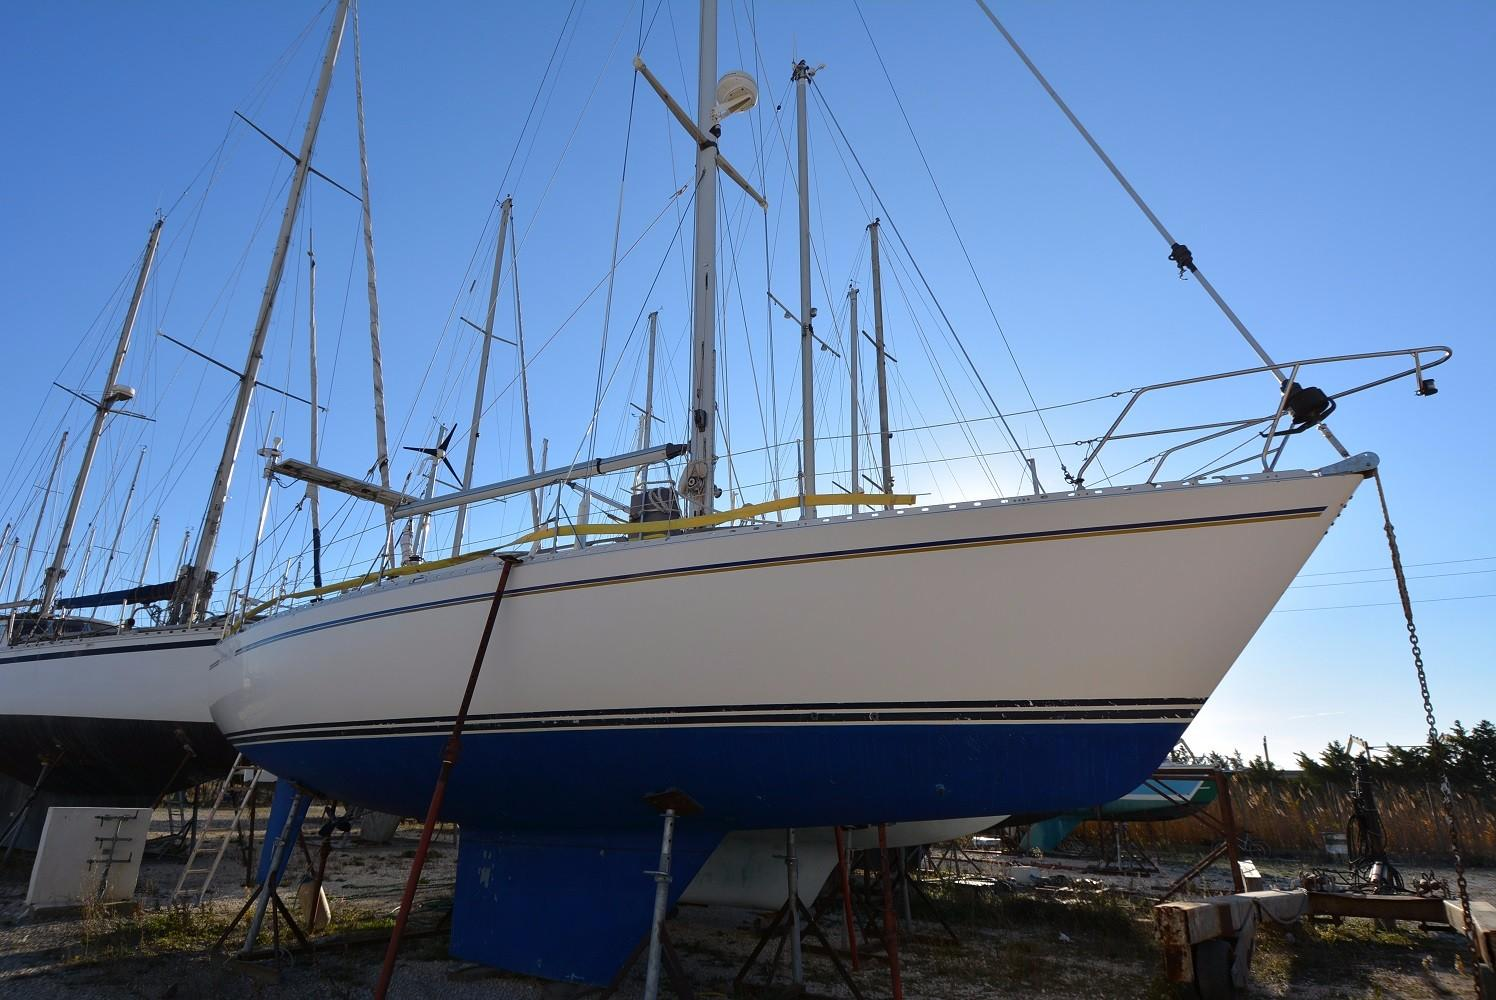 1990 moody 376 port saint louis du rhone france - Navy service port saint louis du rhone ...